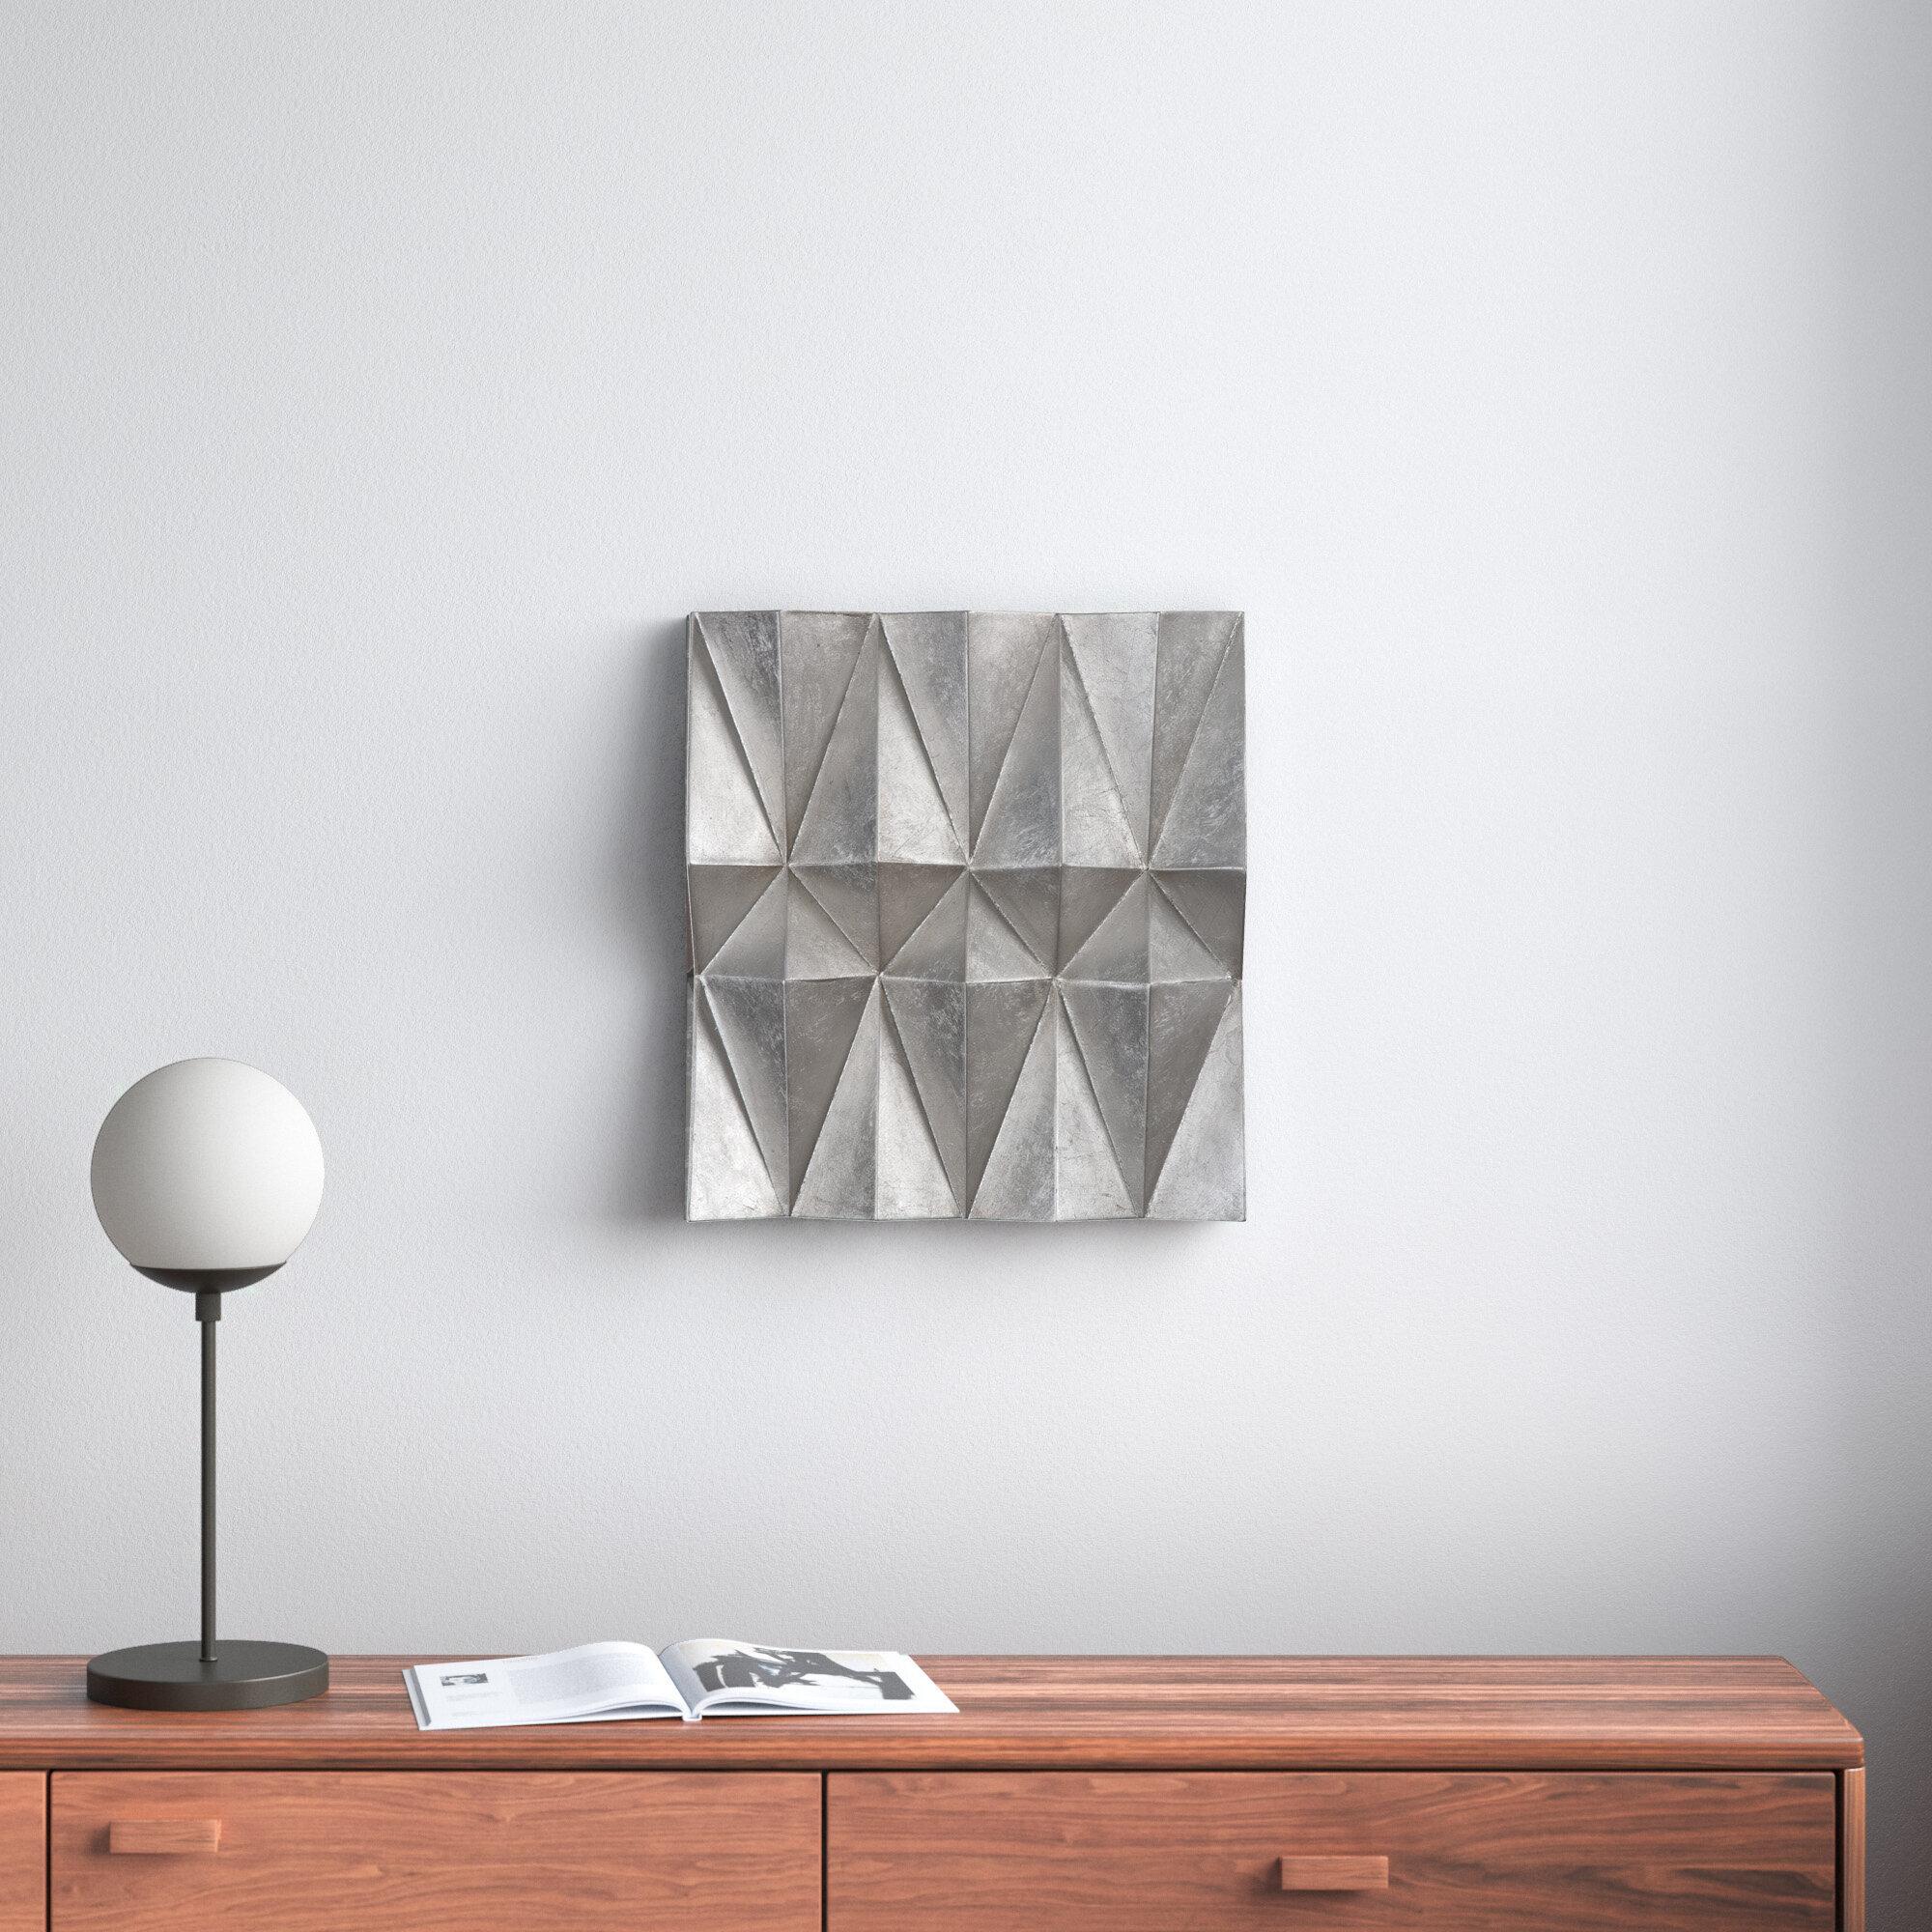 3 Piece Silver Metal Wall Decor Set Reviews Allmodern